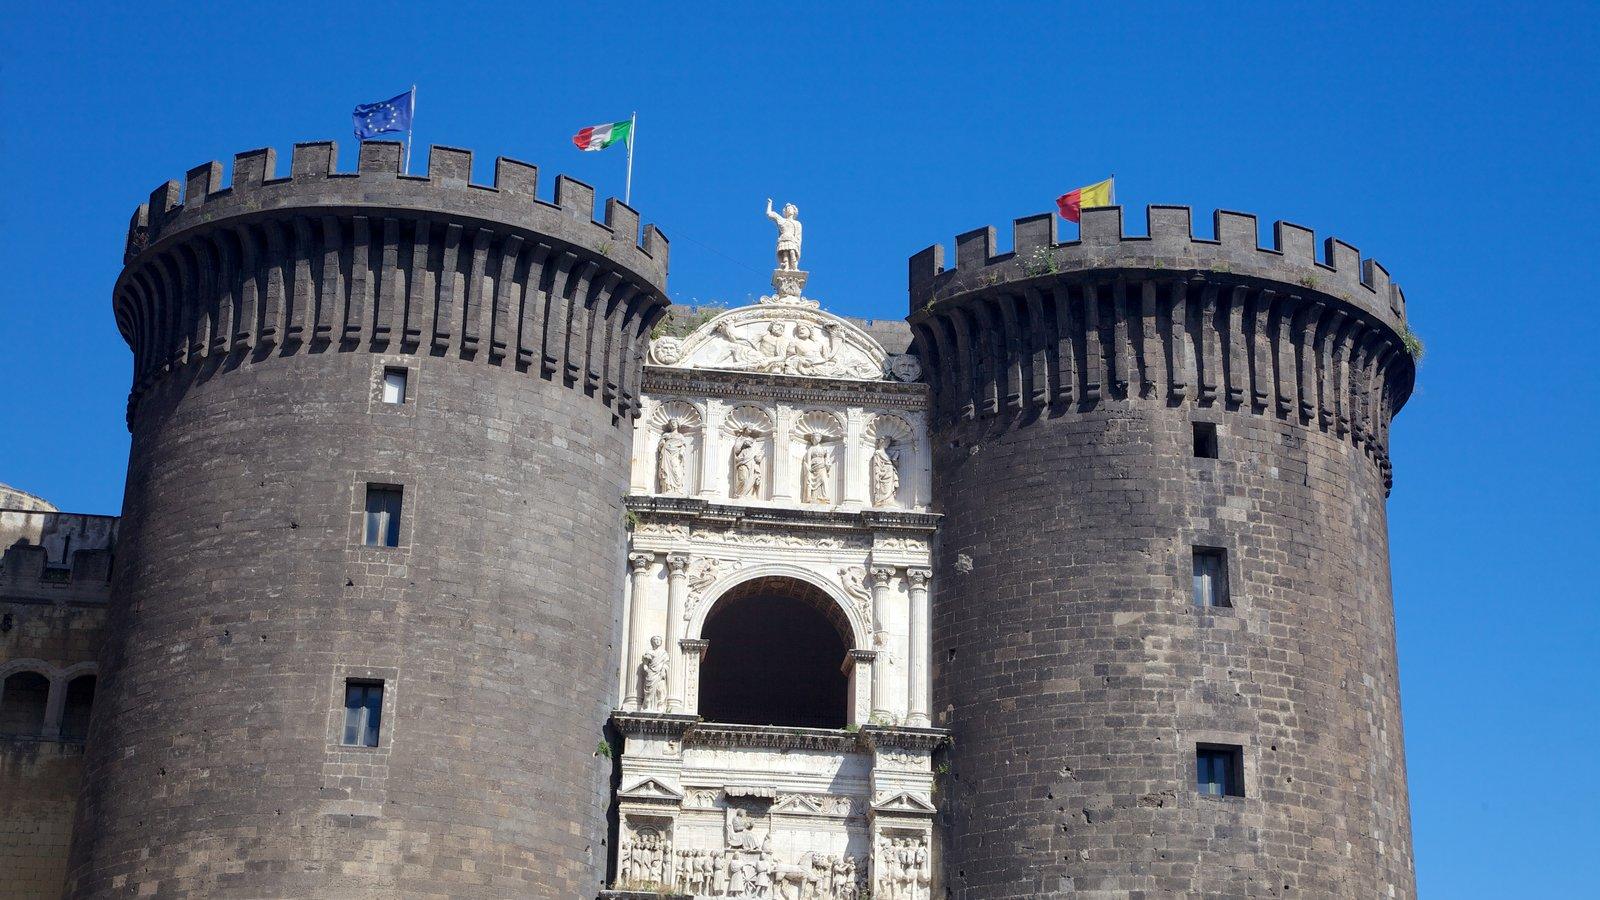 Piazza del Municipio que inclui arquitetura de patrimônio e um castelo